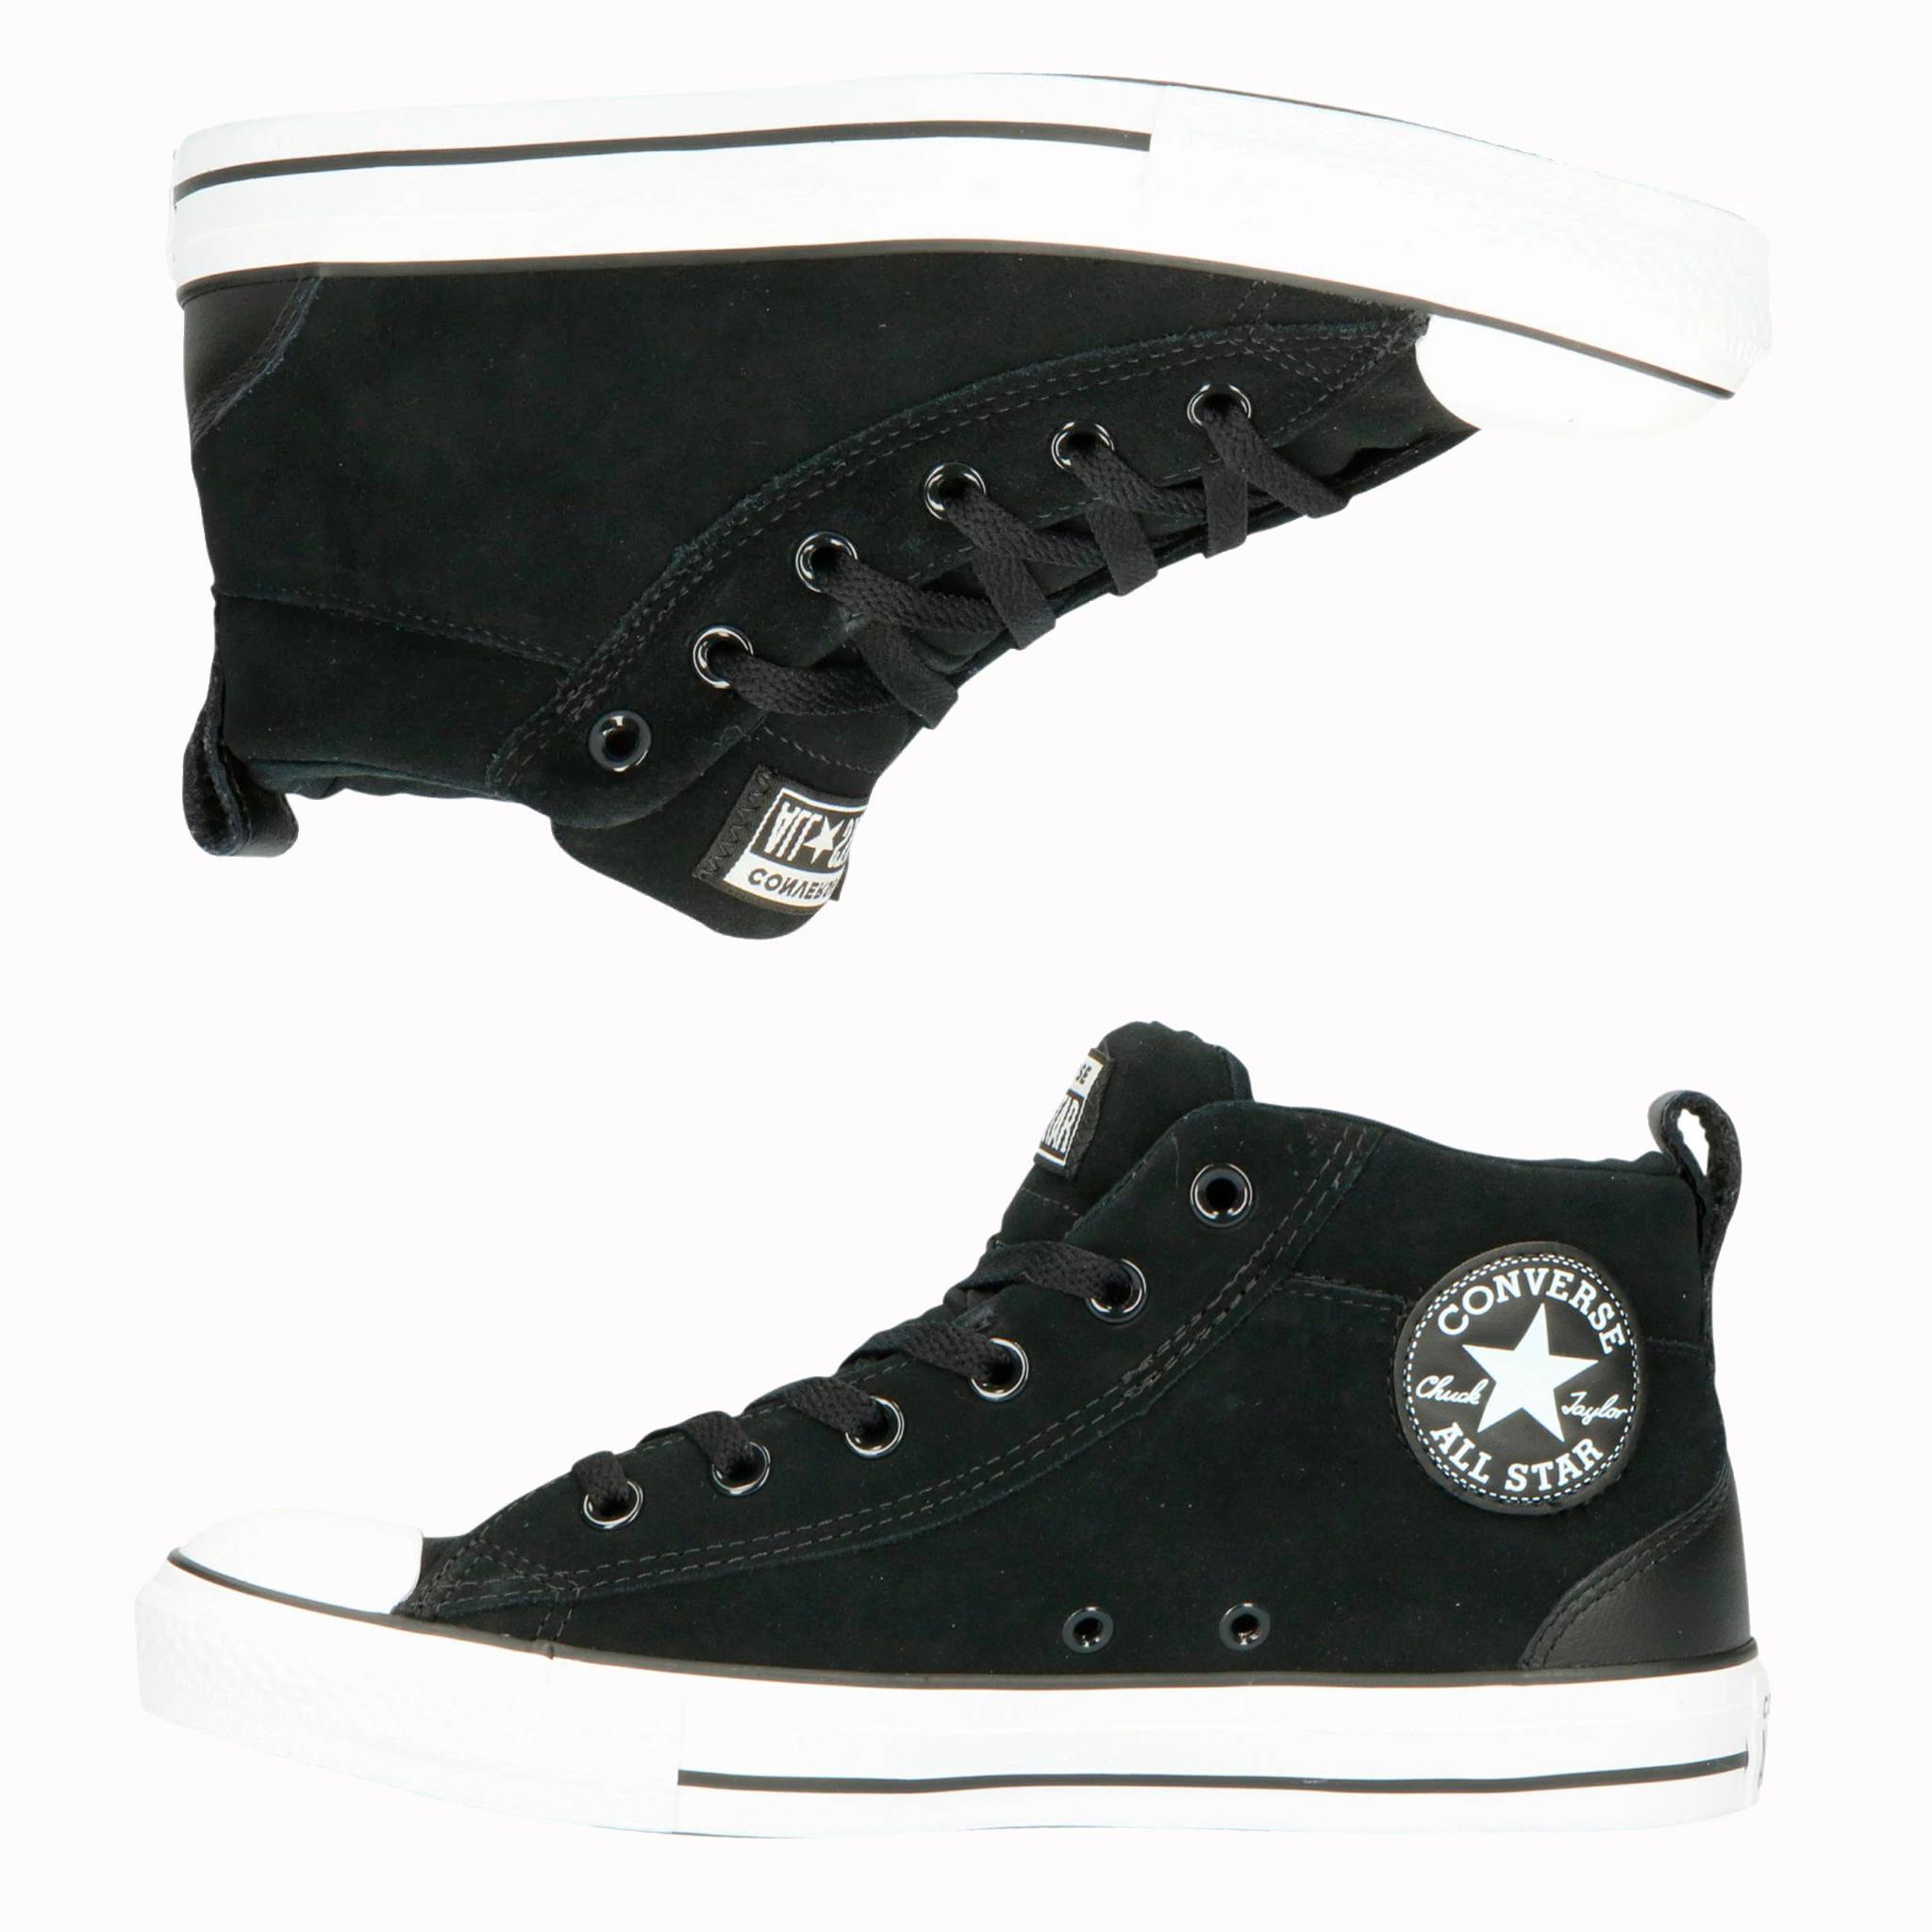 Converse All Stars Street sneakers -66% @ Zalando